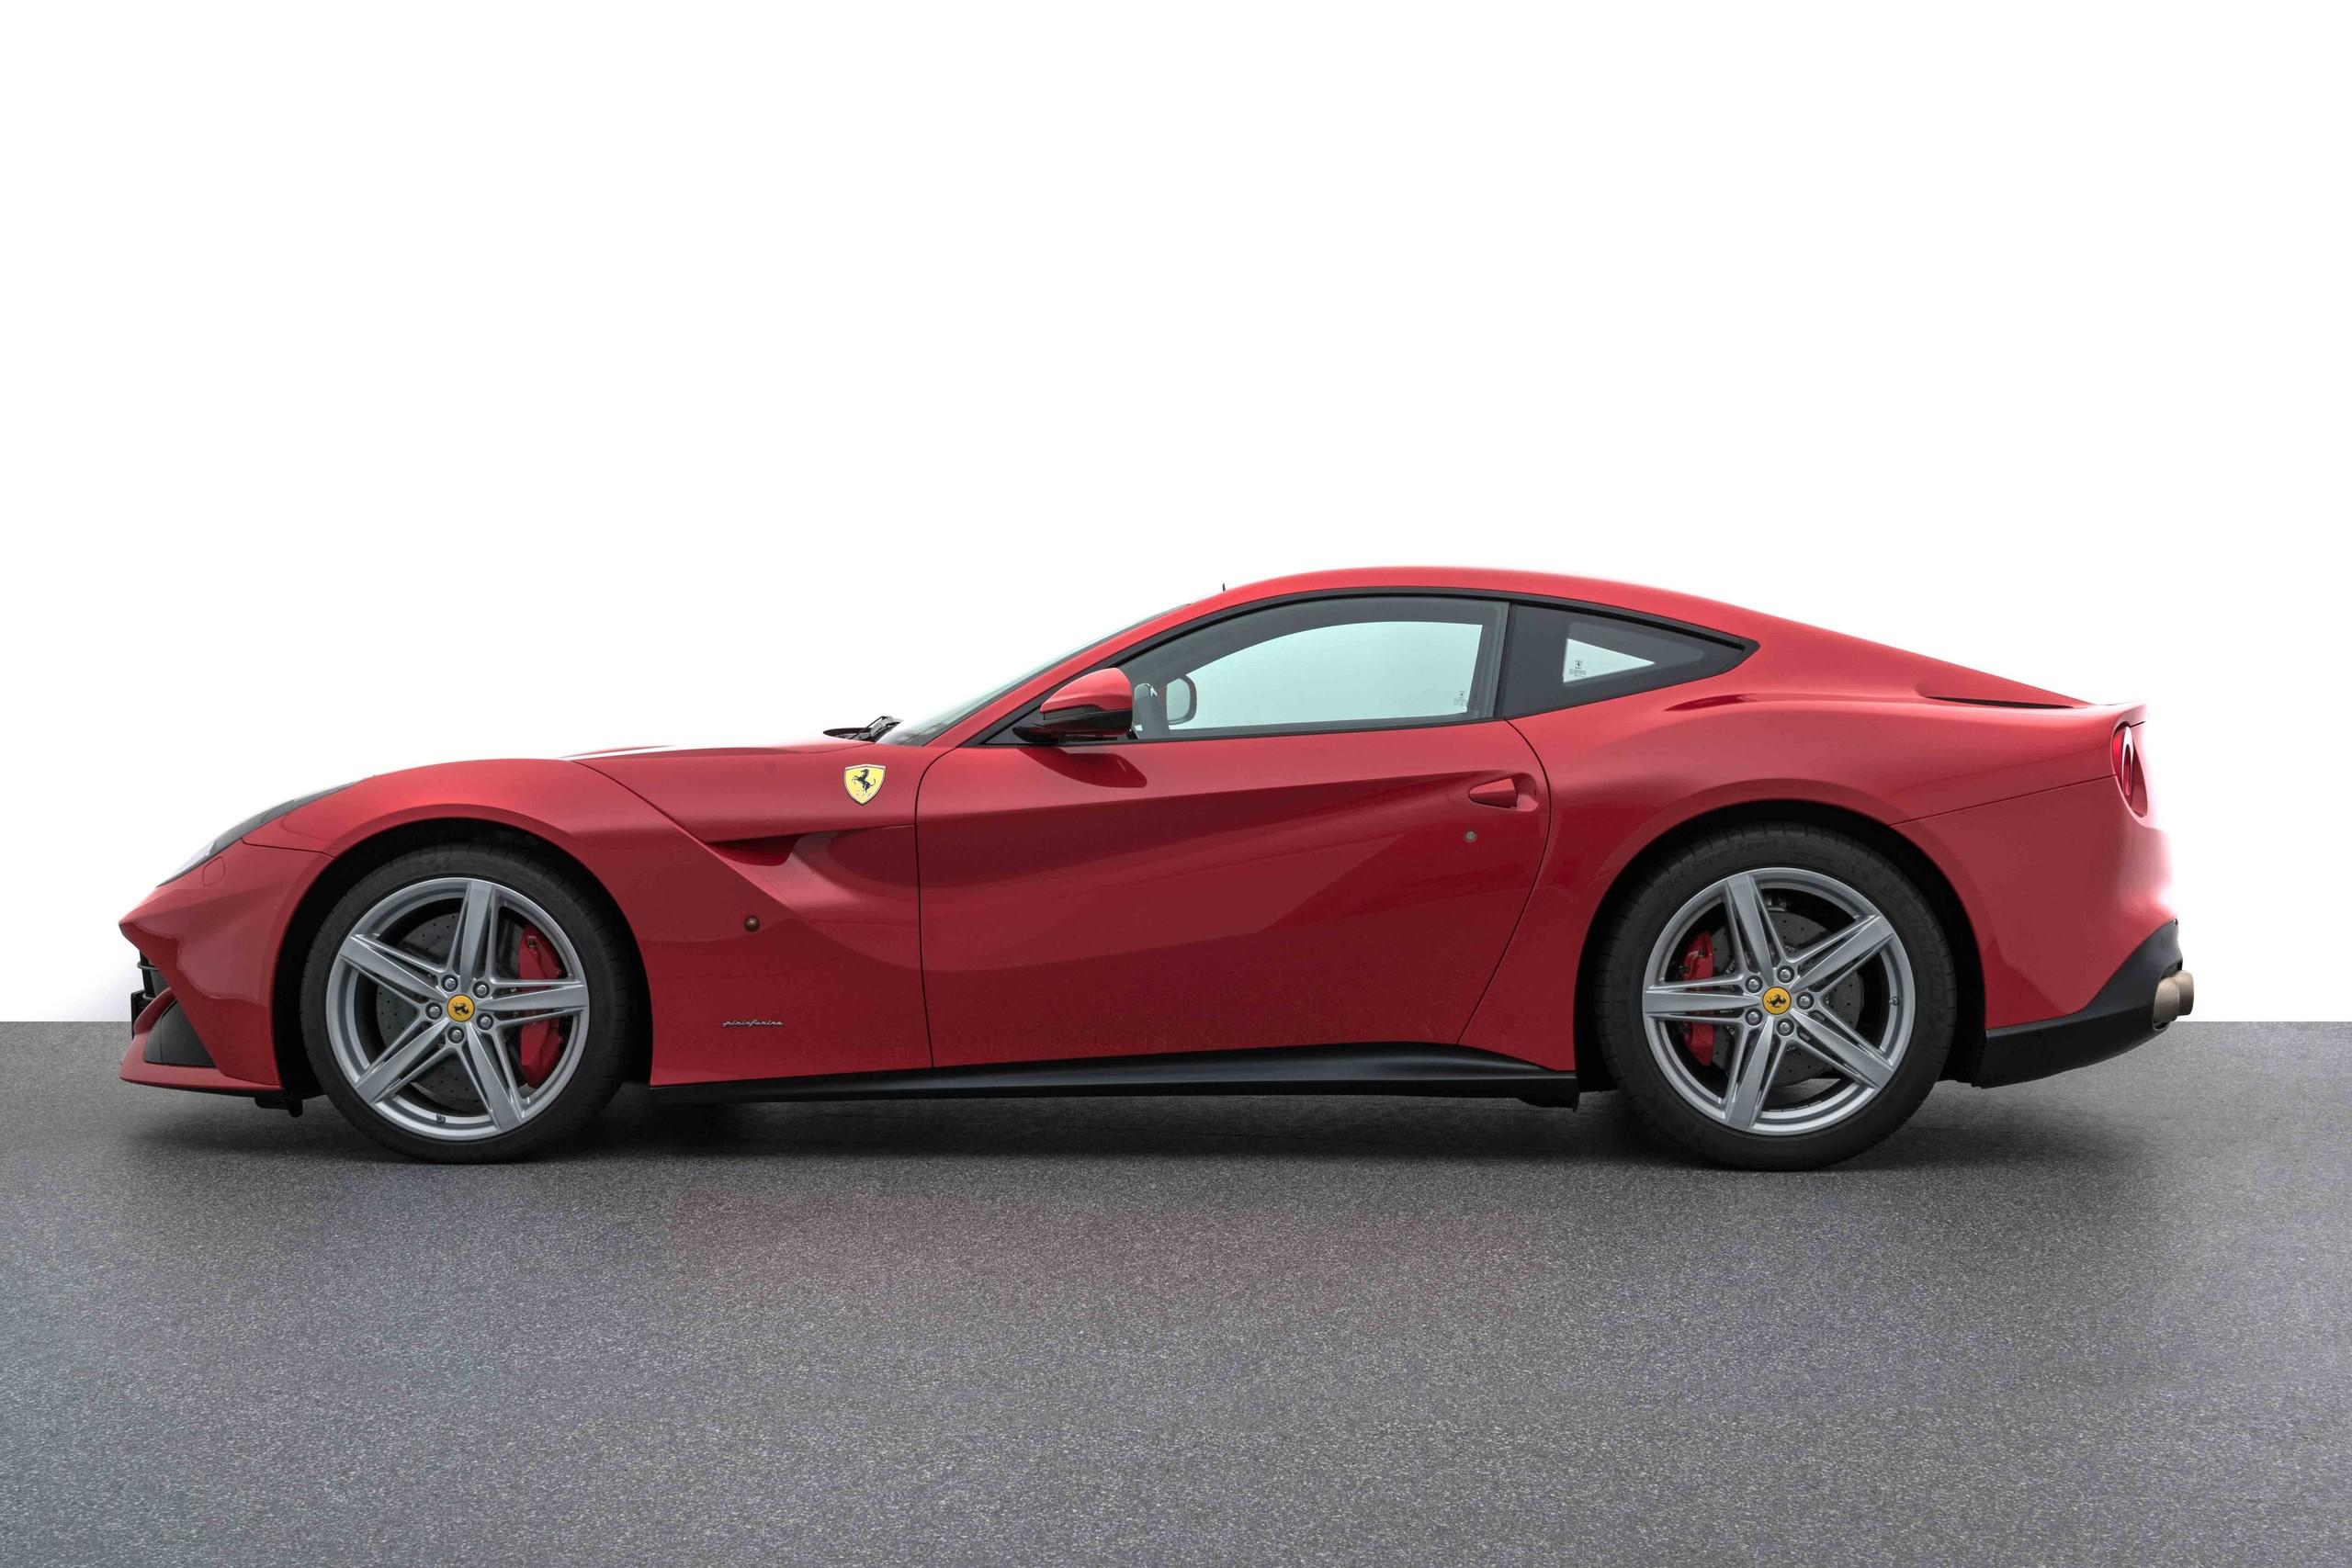 Ferrari F12 BERLINETTA DCT